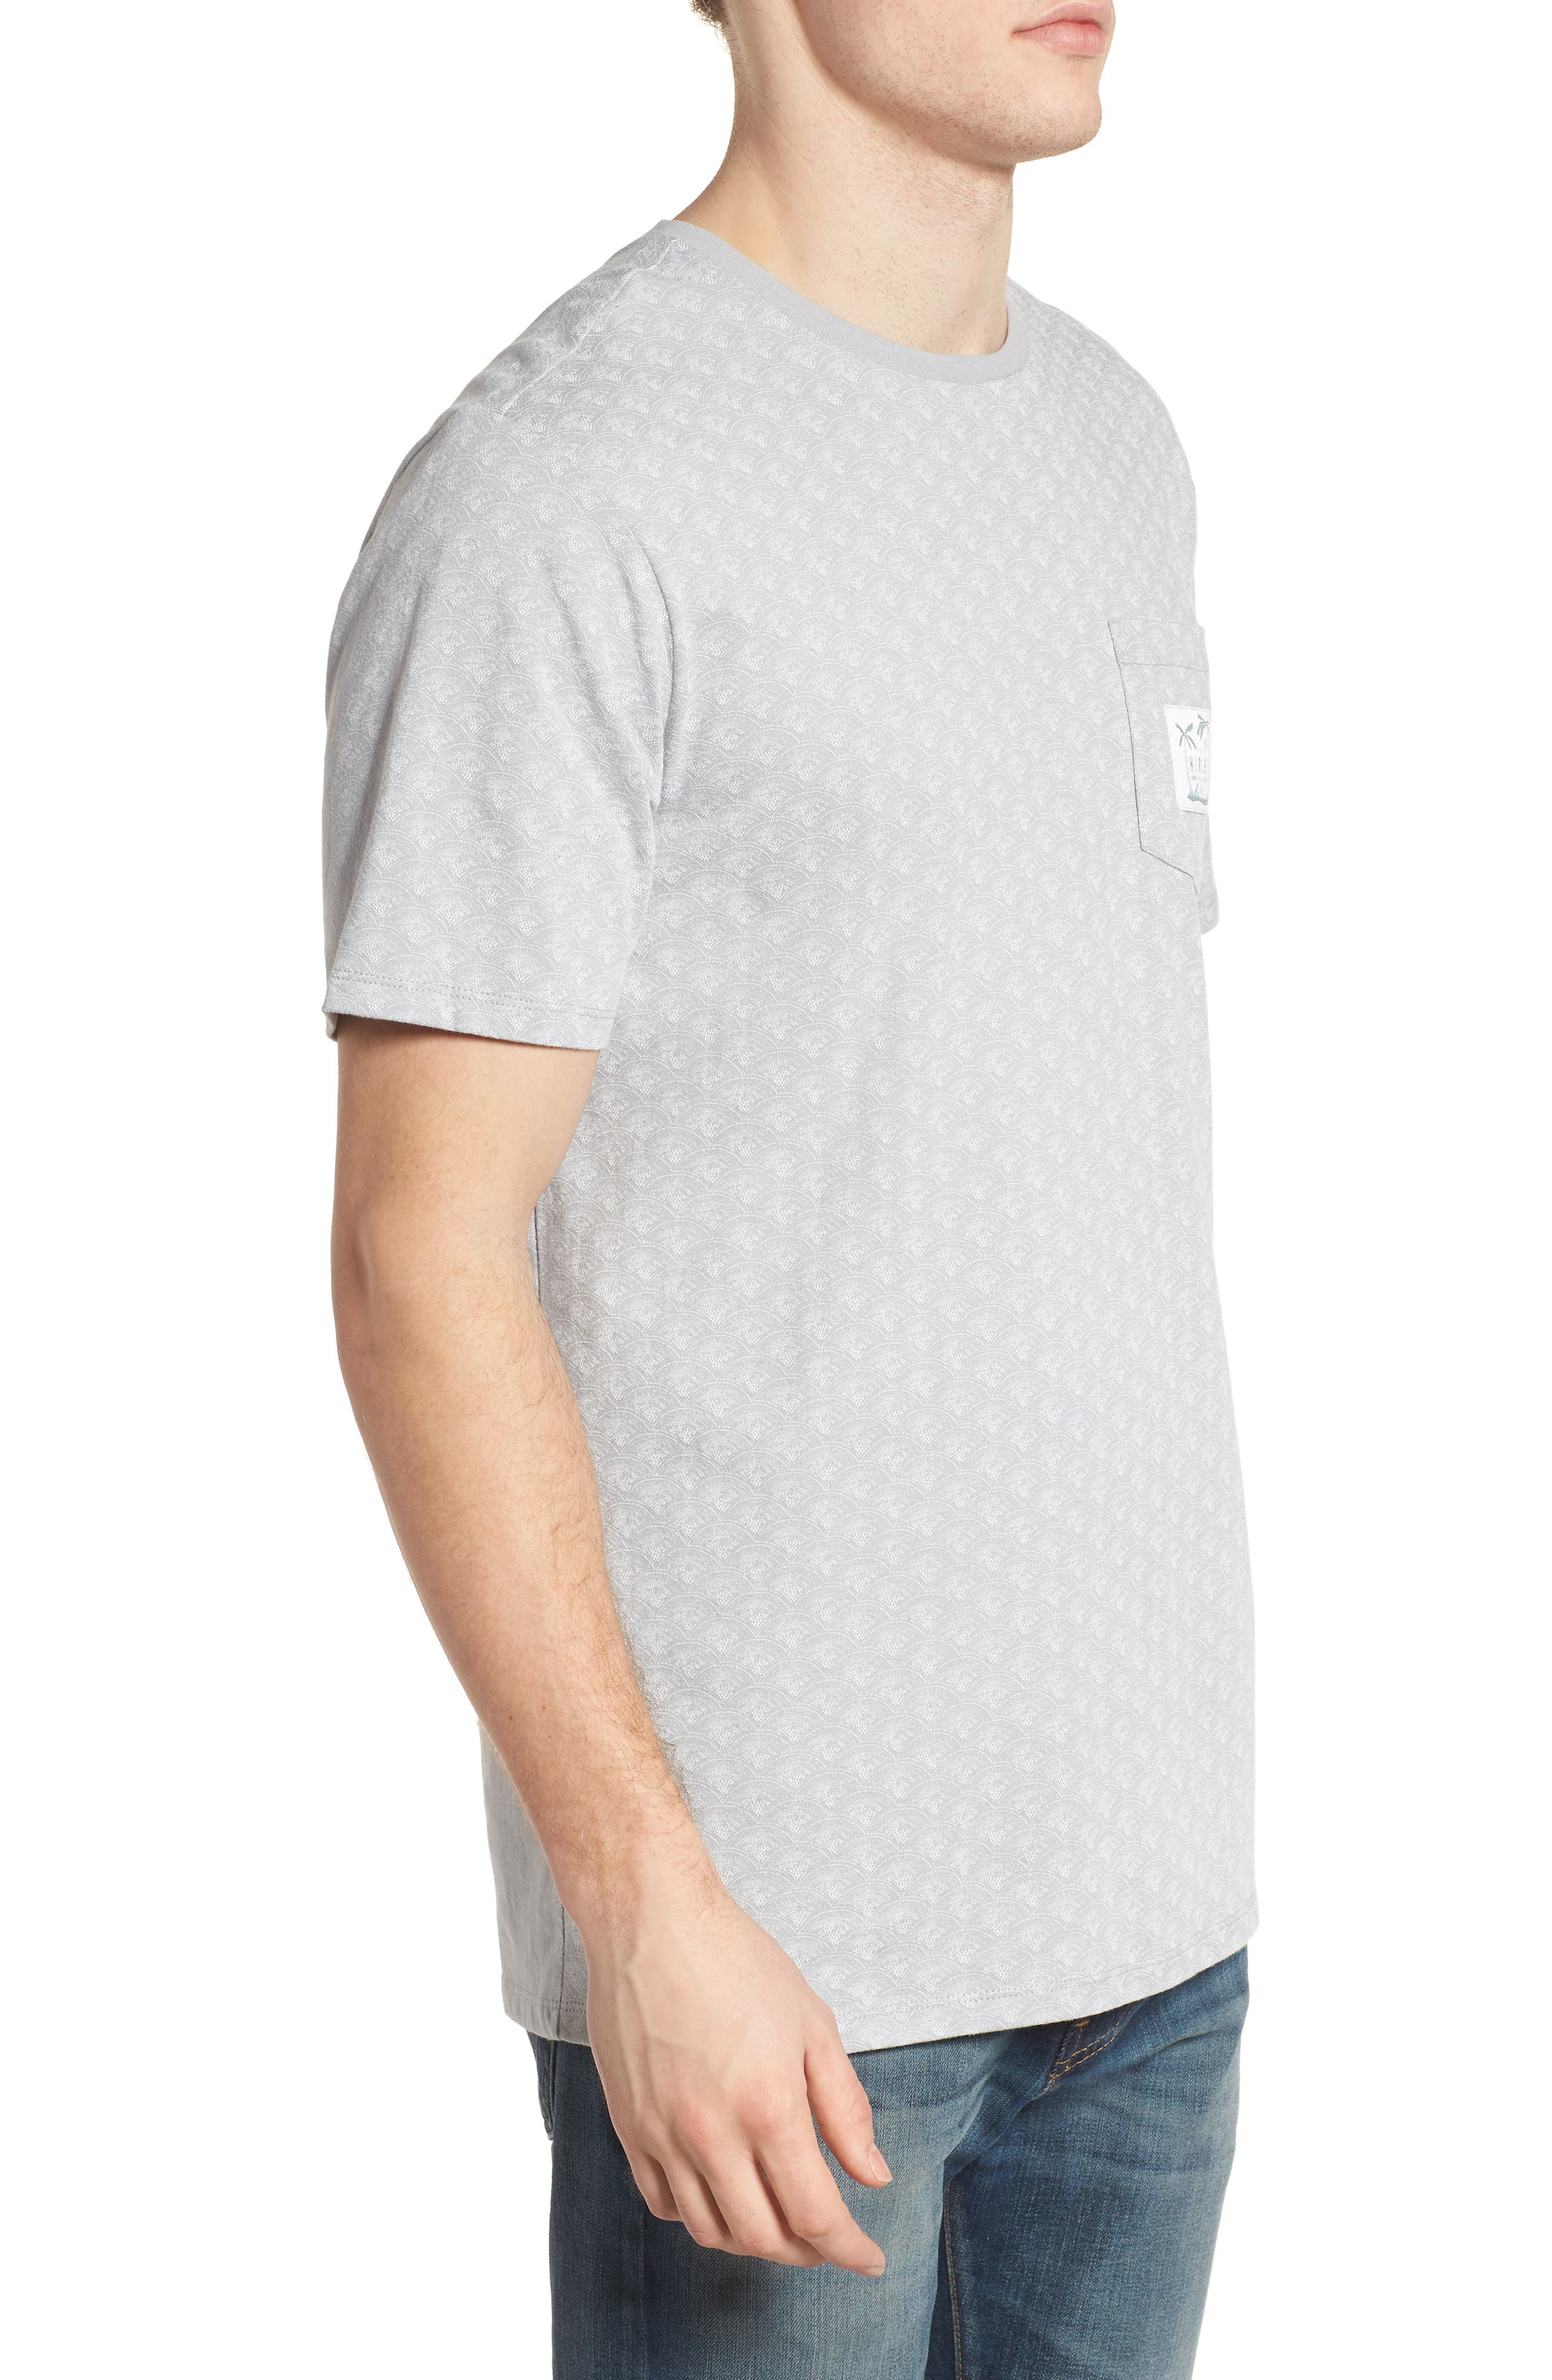 Pescado Short Sleeve T-Shirt,                             Alternate thumbnail 3, color,                             Sail